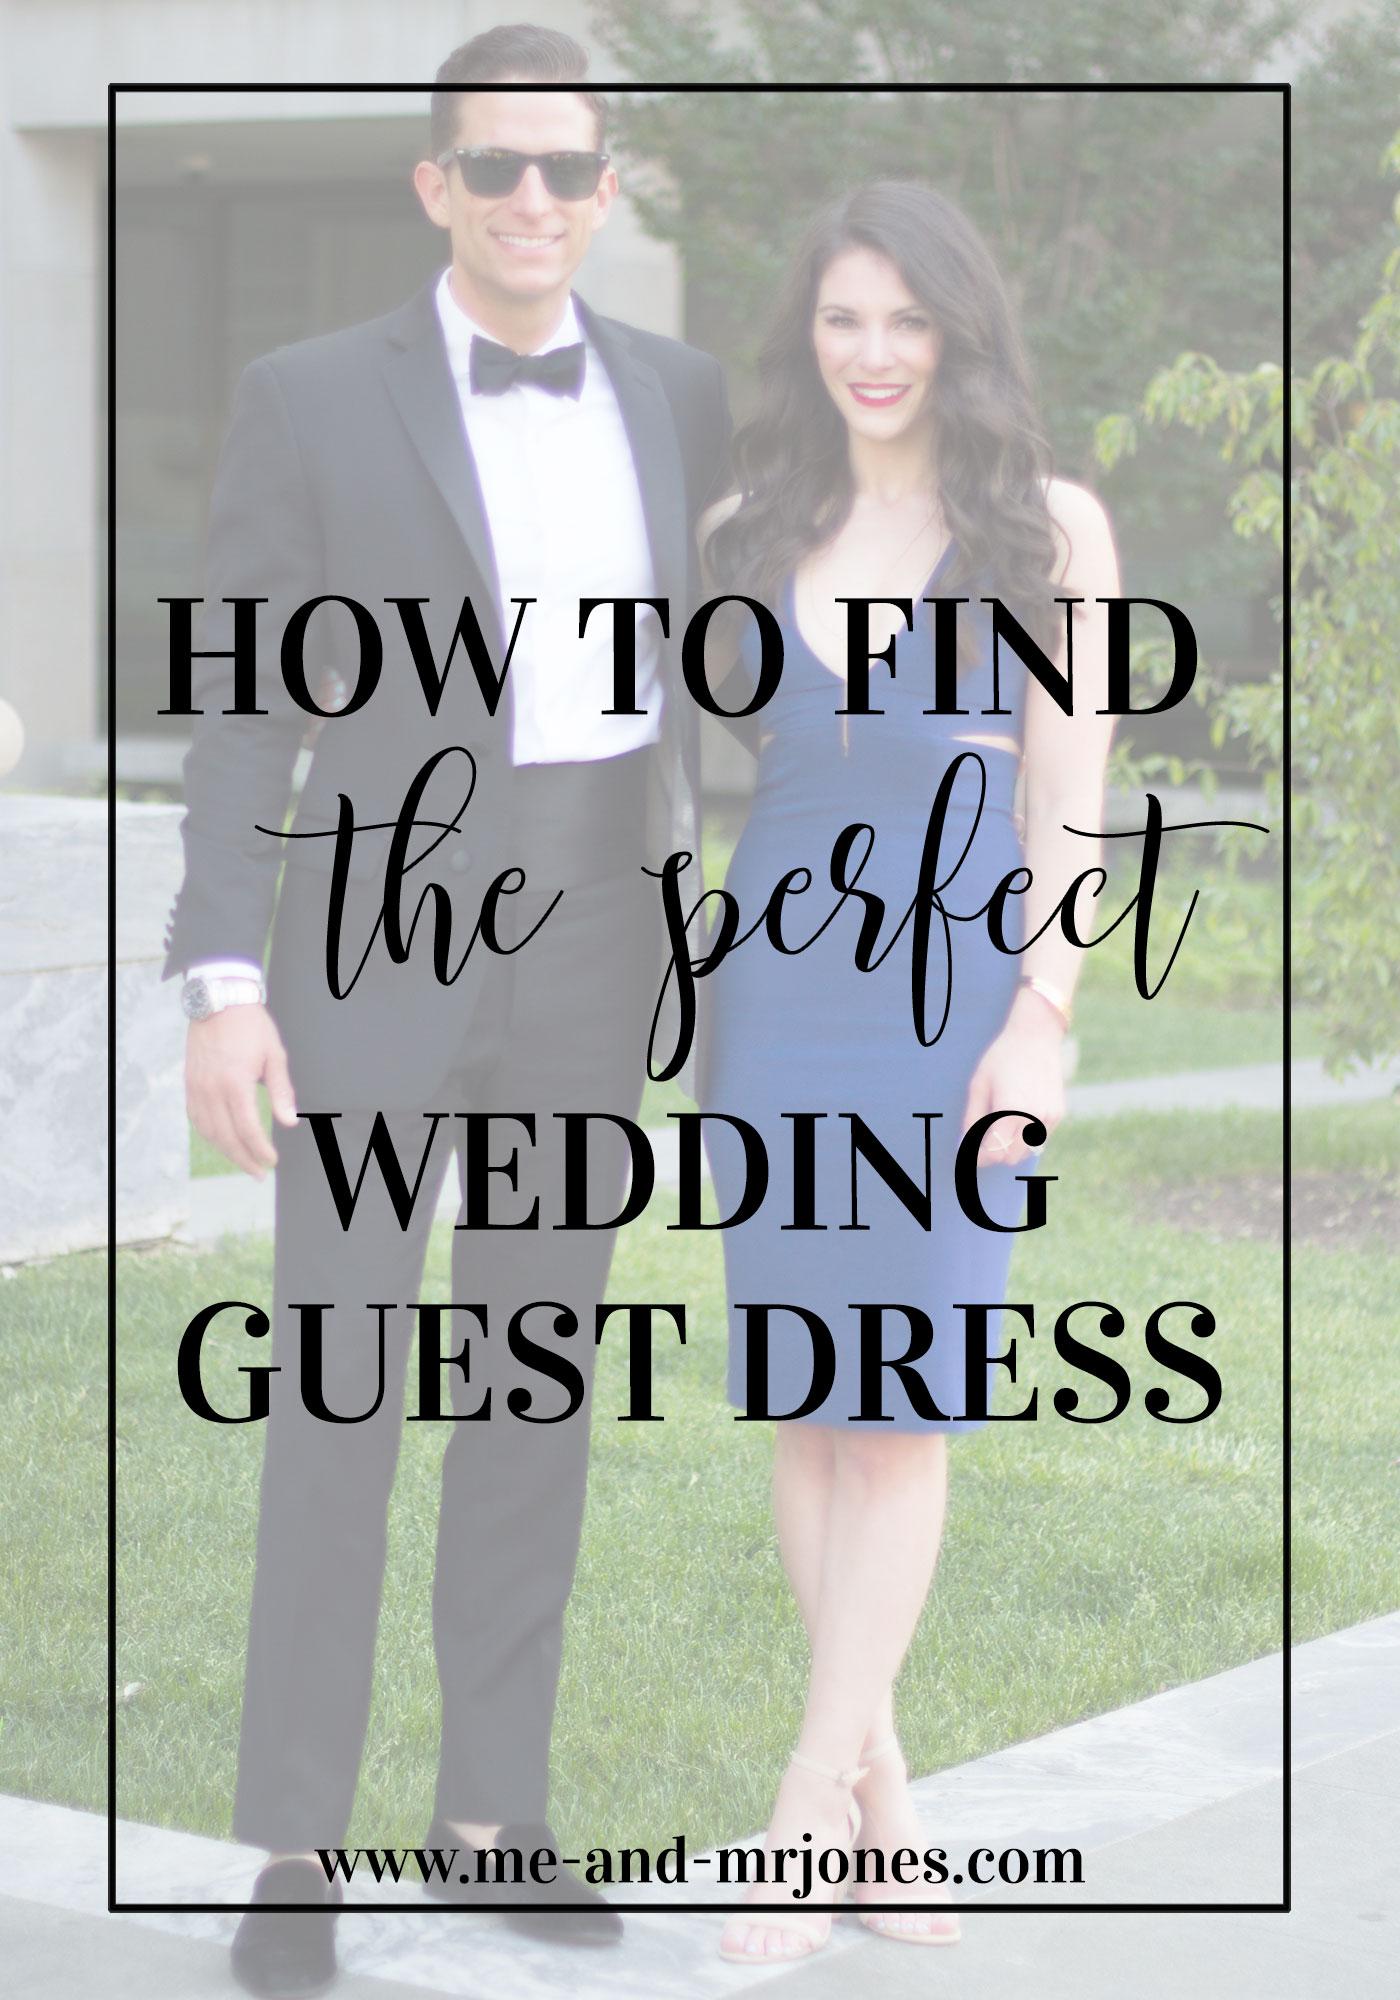 What to wear to a summer wedding, bodycon dress, black tie wedding attire, cute wedding guest dresses.